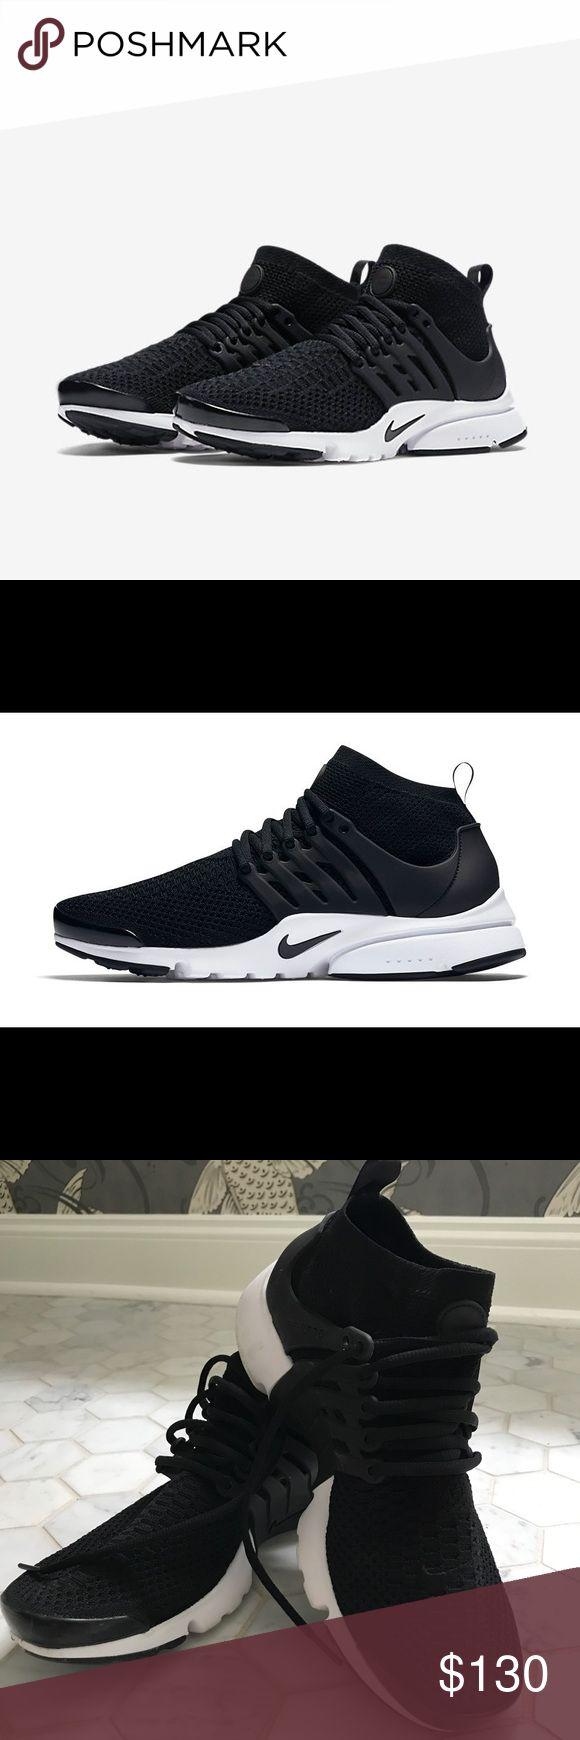 Nike Air Presto Sneaker Worn twice Nike Shoes Sneakers